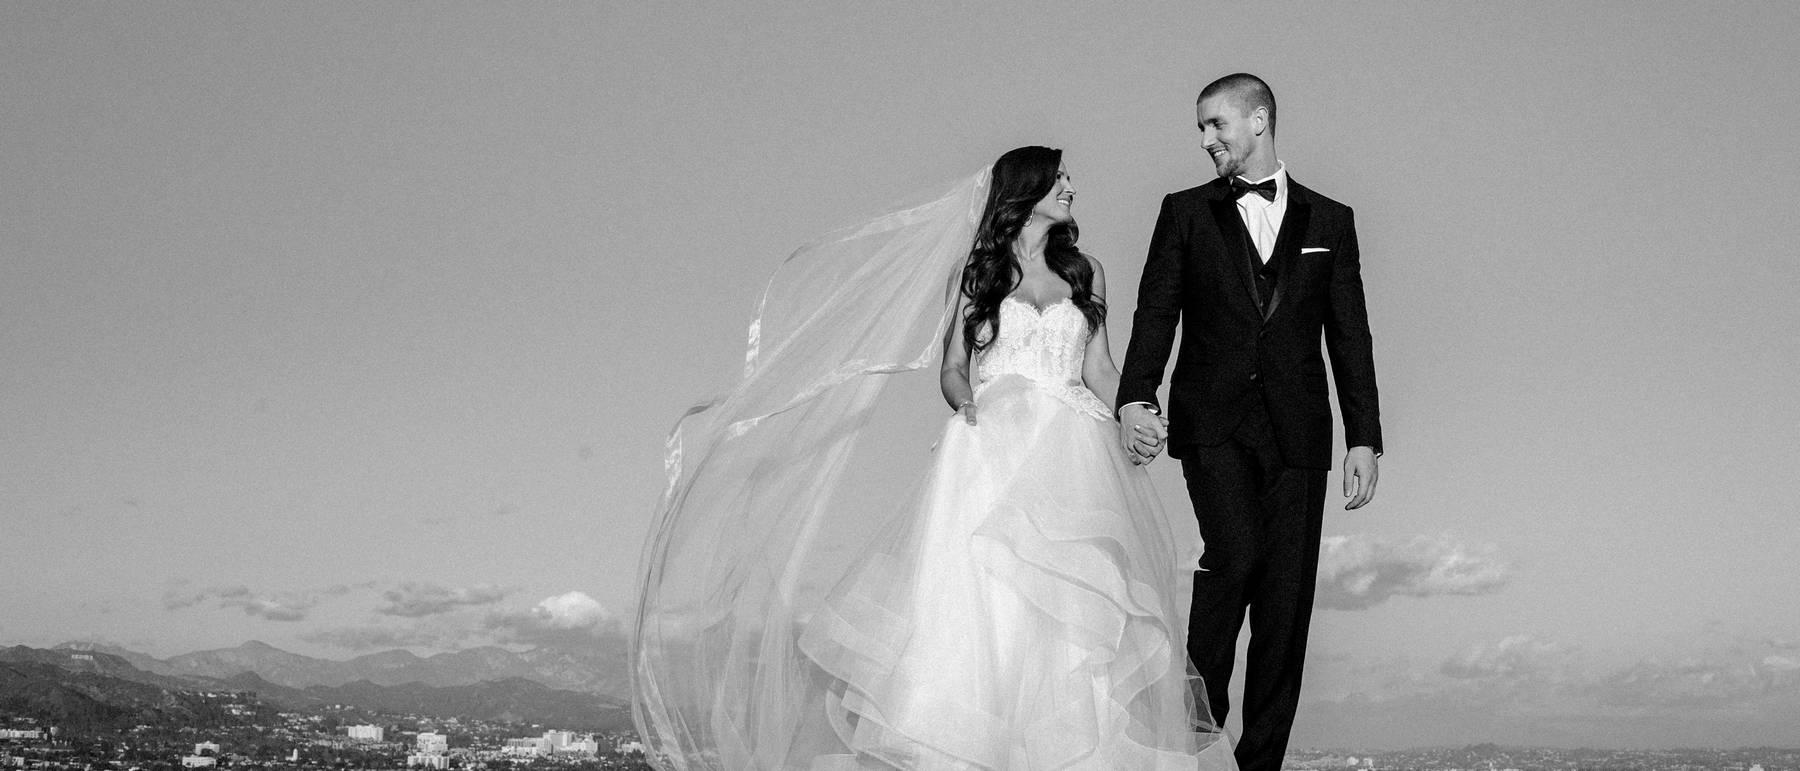 johnandjoseph-wedding-photographer-hz-slider-287